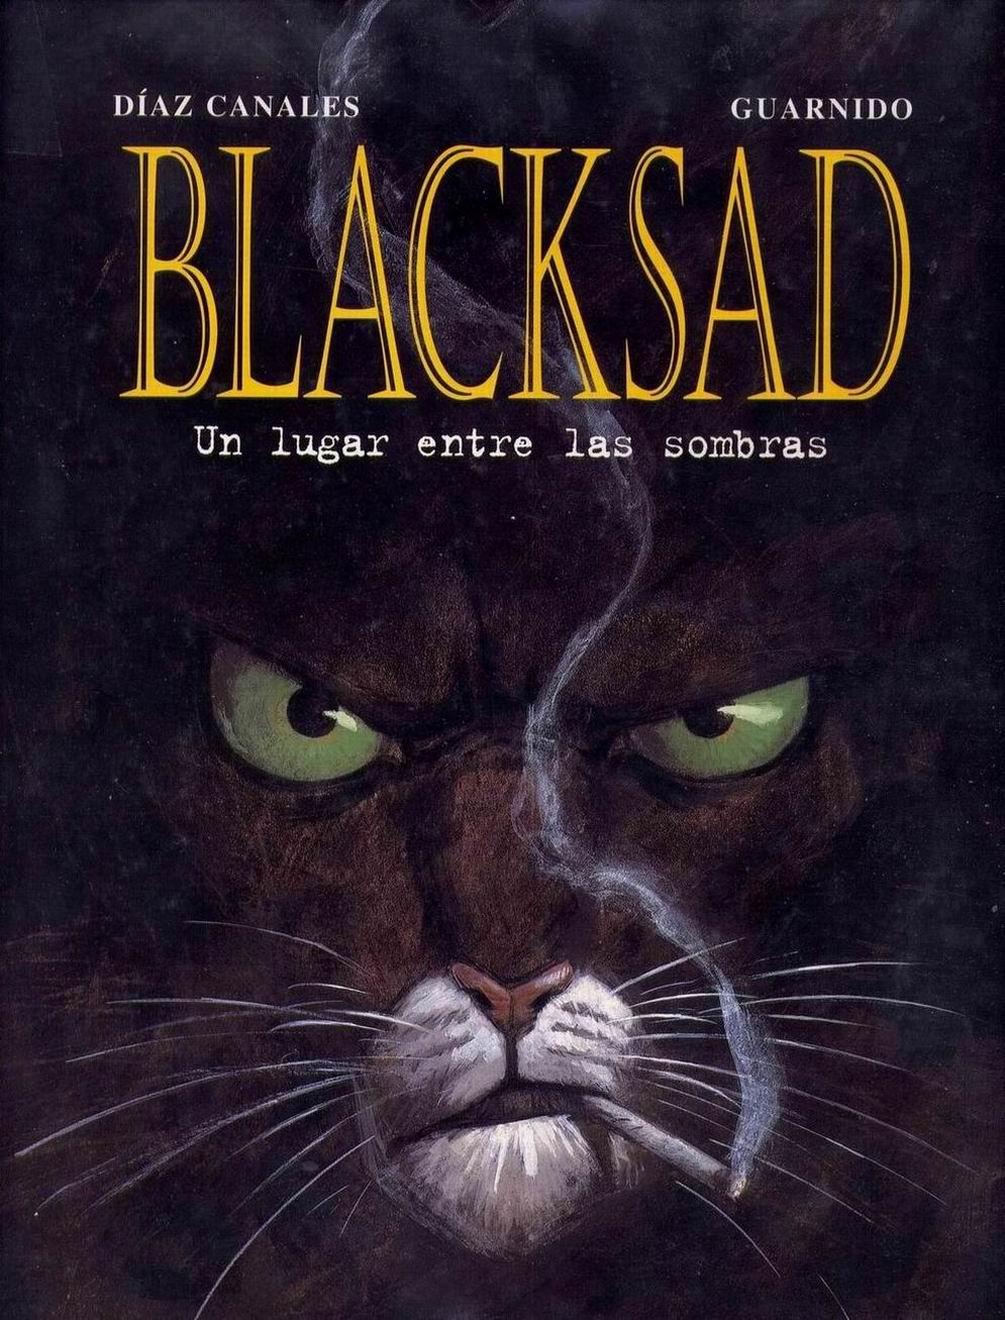 Blacksad [1 - 4 dd] Blacksad%2B-%2BUn%2BLugar%2BEntre%2BLas%2BSombras-00